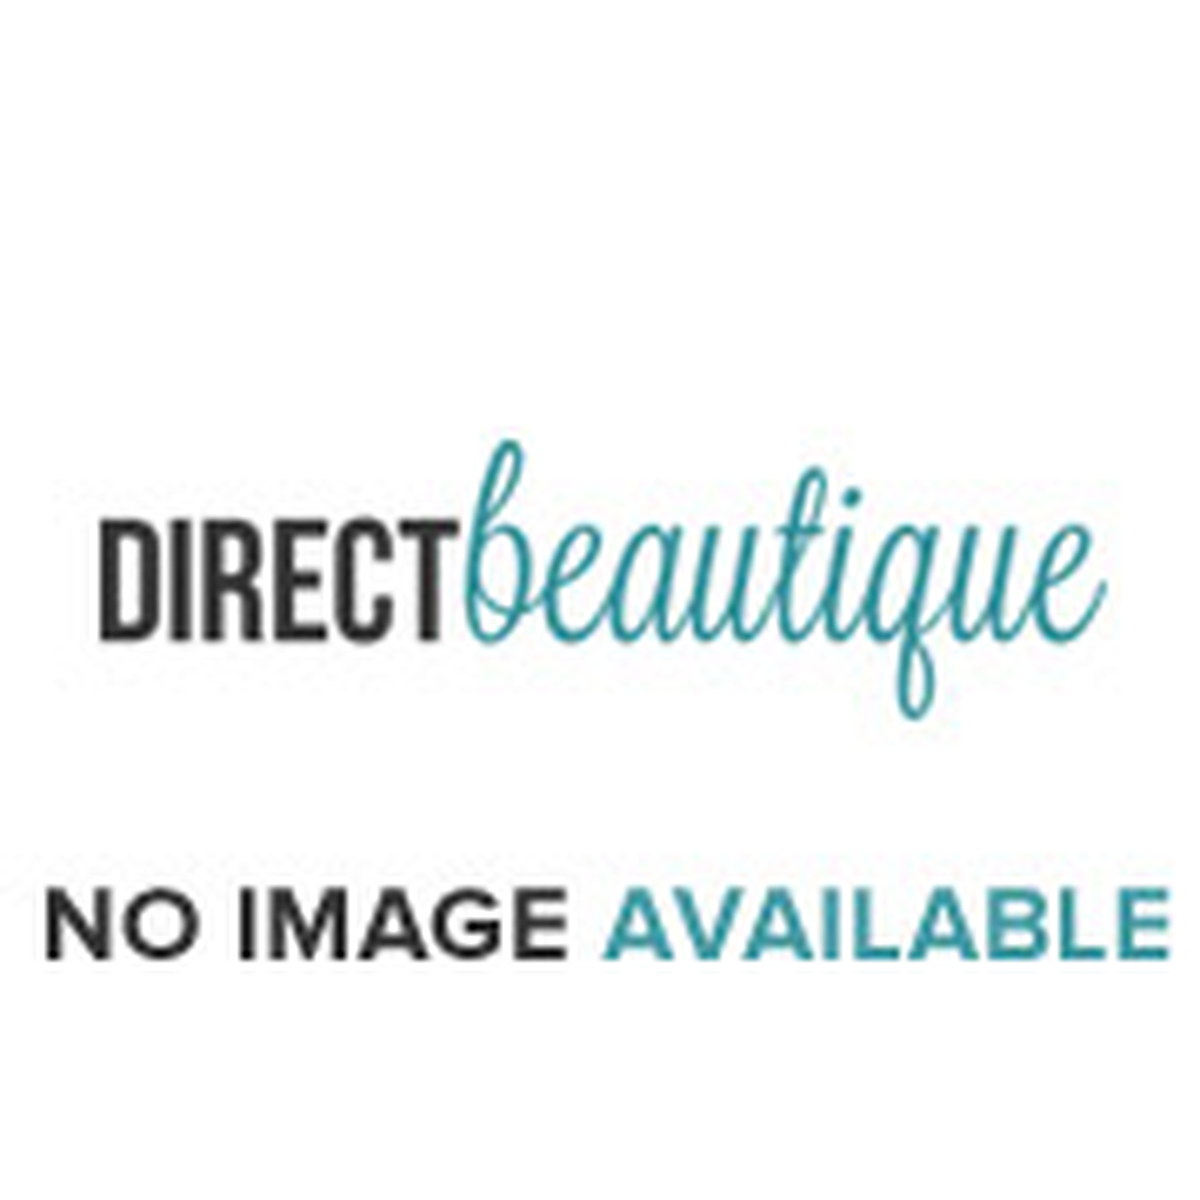 Clarins 30ml Daily Energizer Cream-Gel